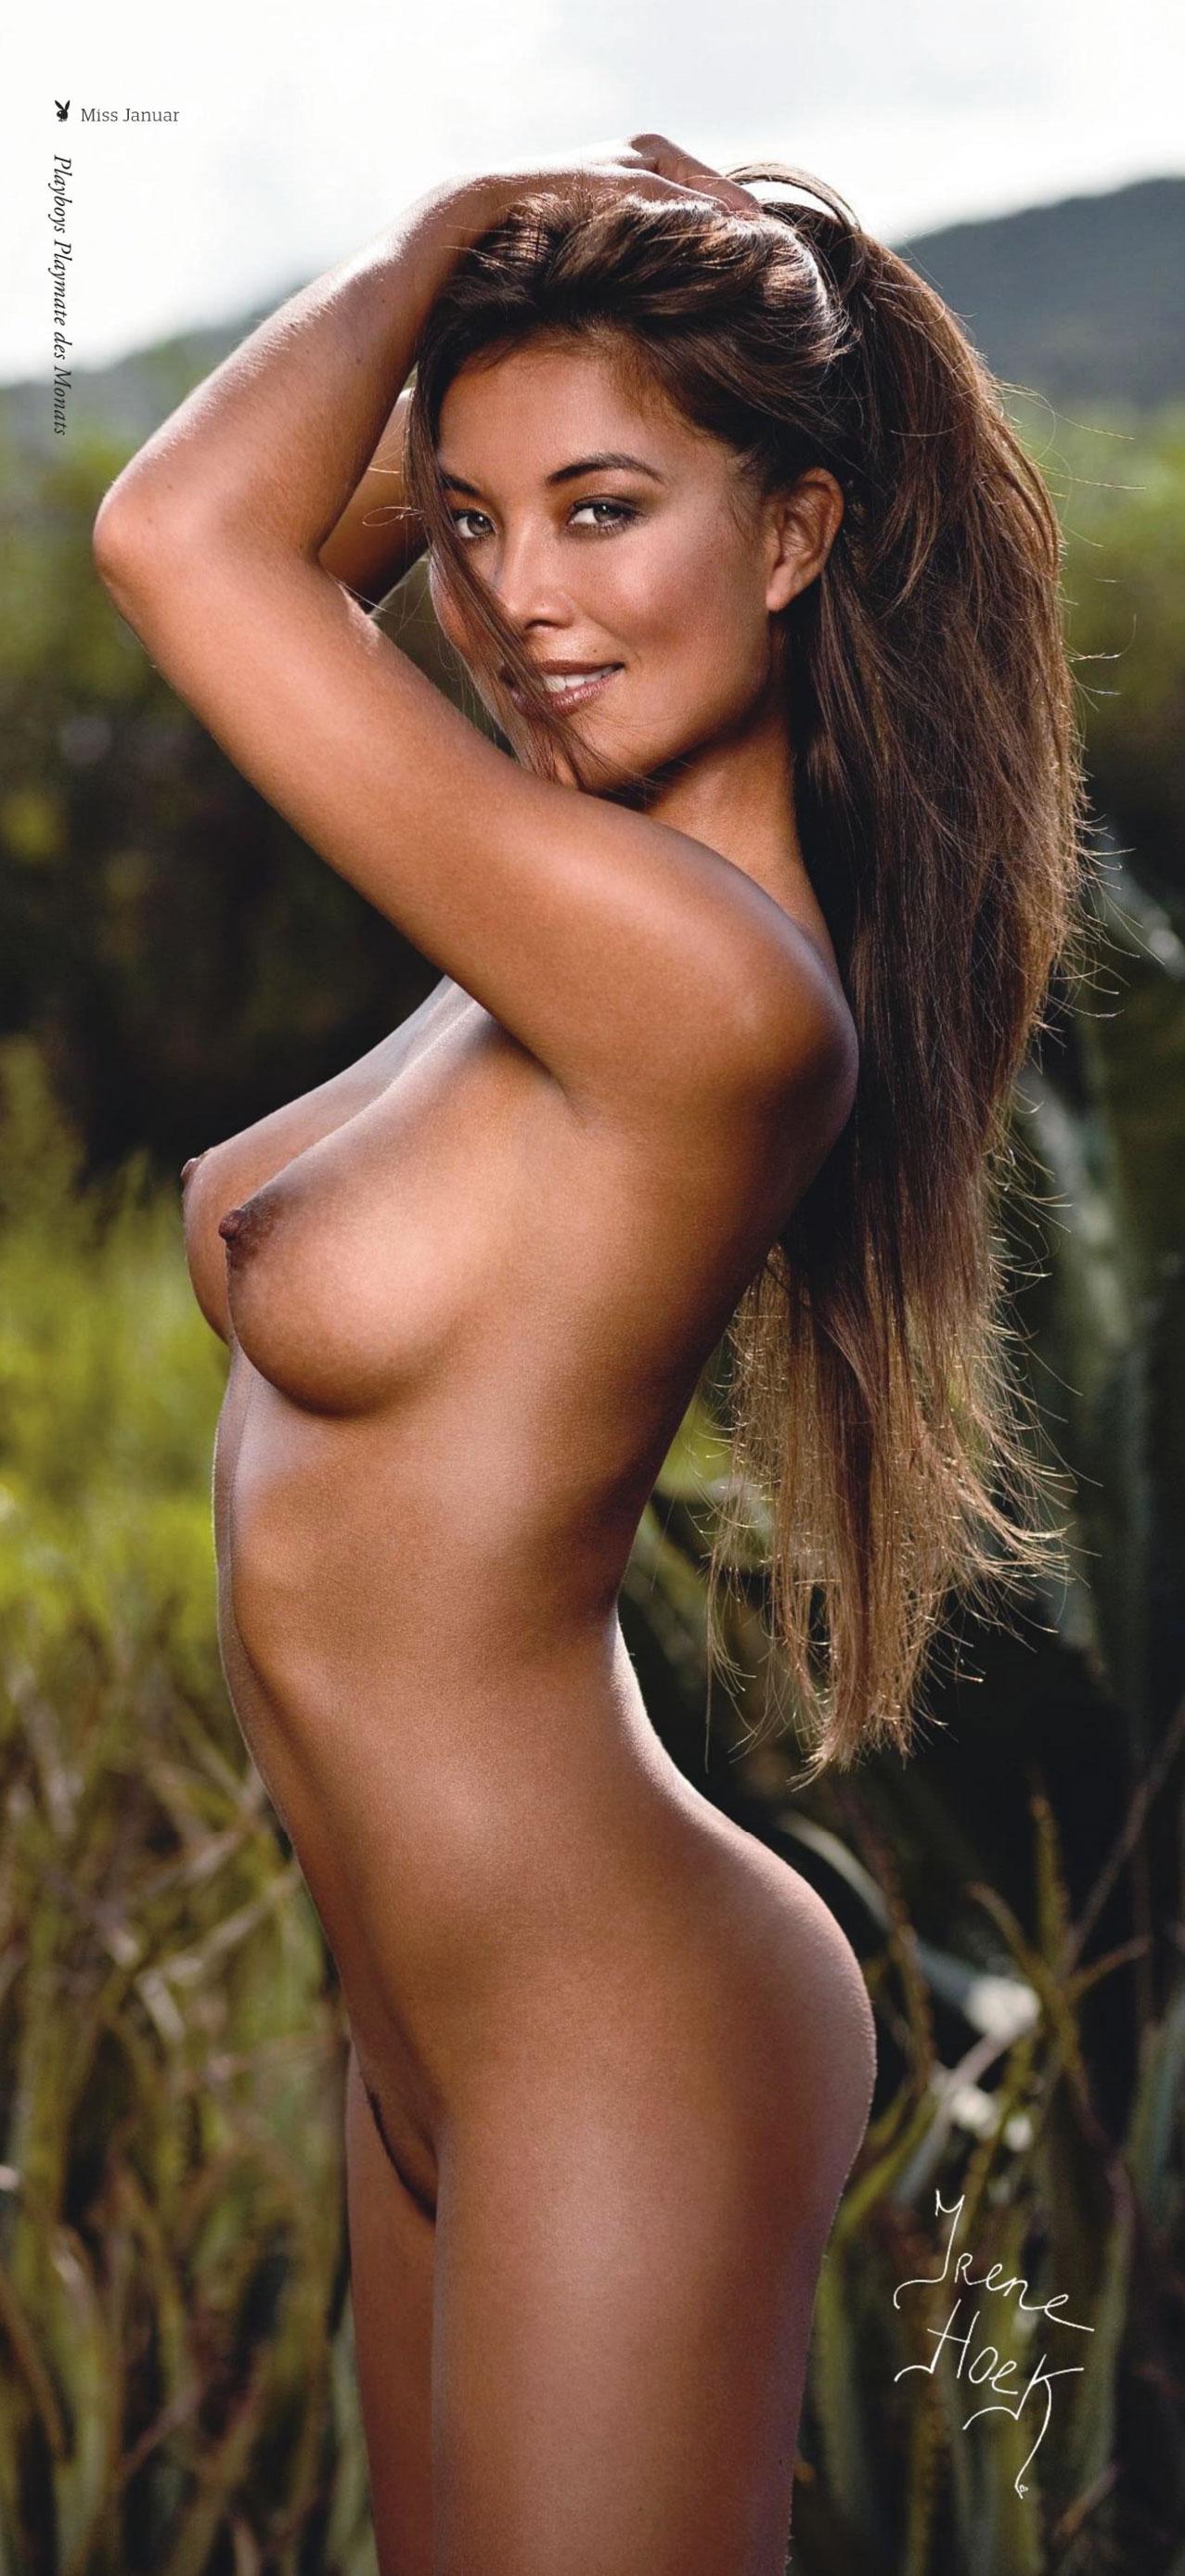 Ирене Хоек / Irene Hoek in Playboy Germany january 2011 - большой постер 1277х2777